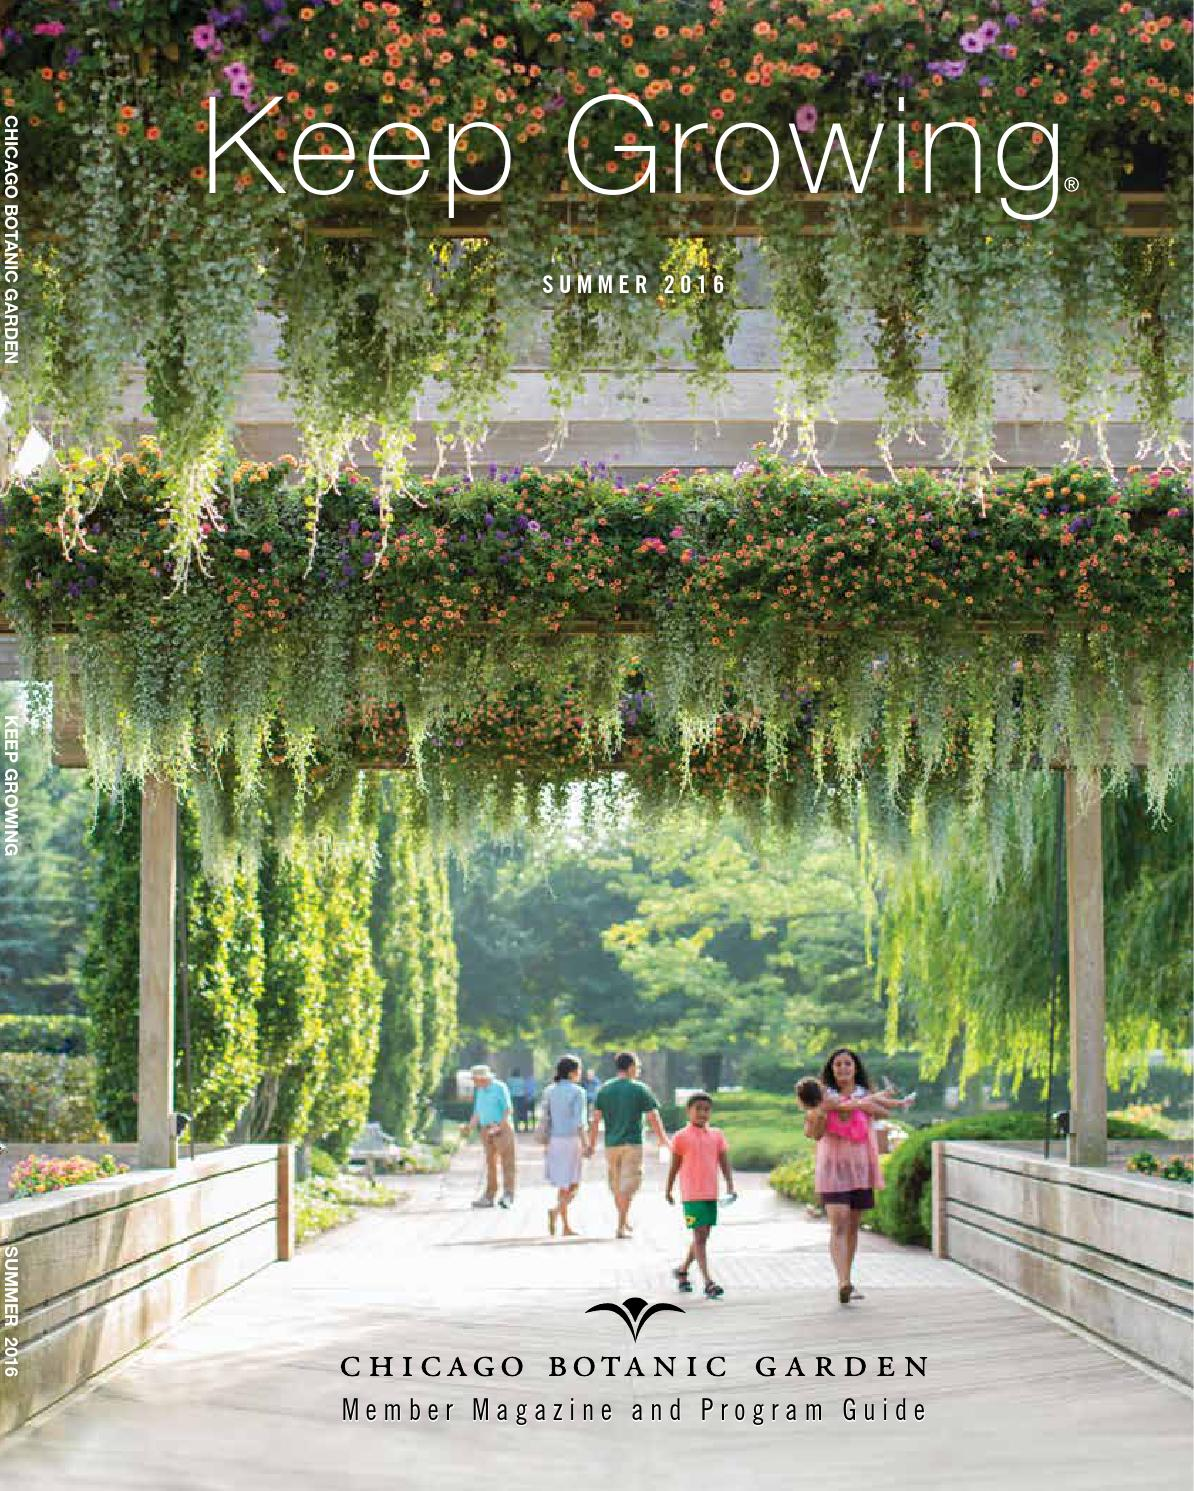 Keep growing summer 2016 by chicago botanic garden issuu for Chicago botanic garden membership